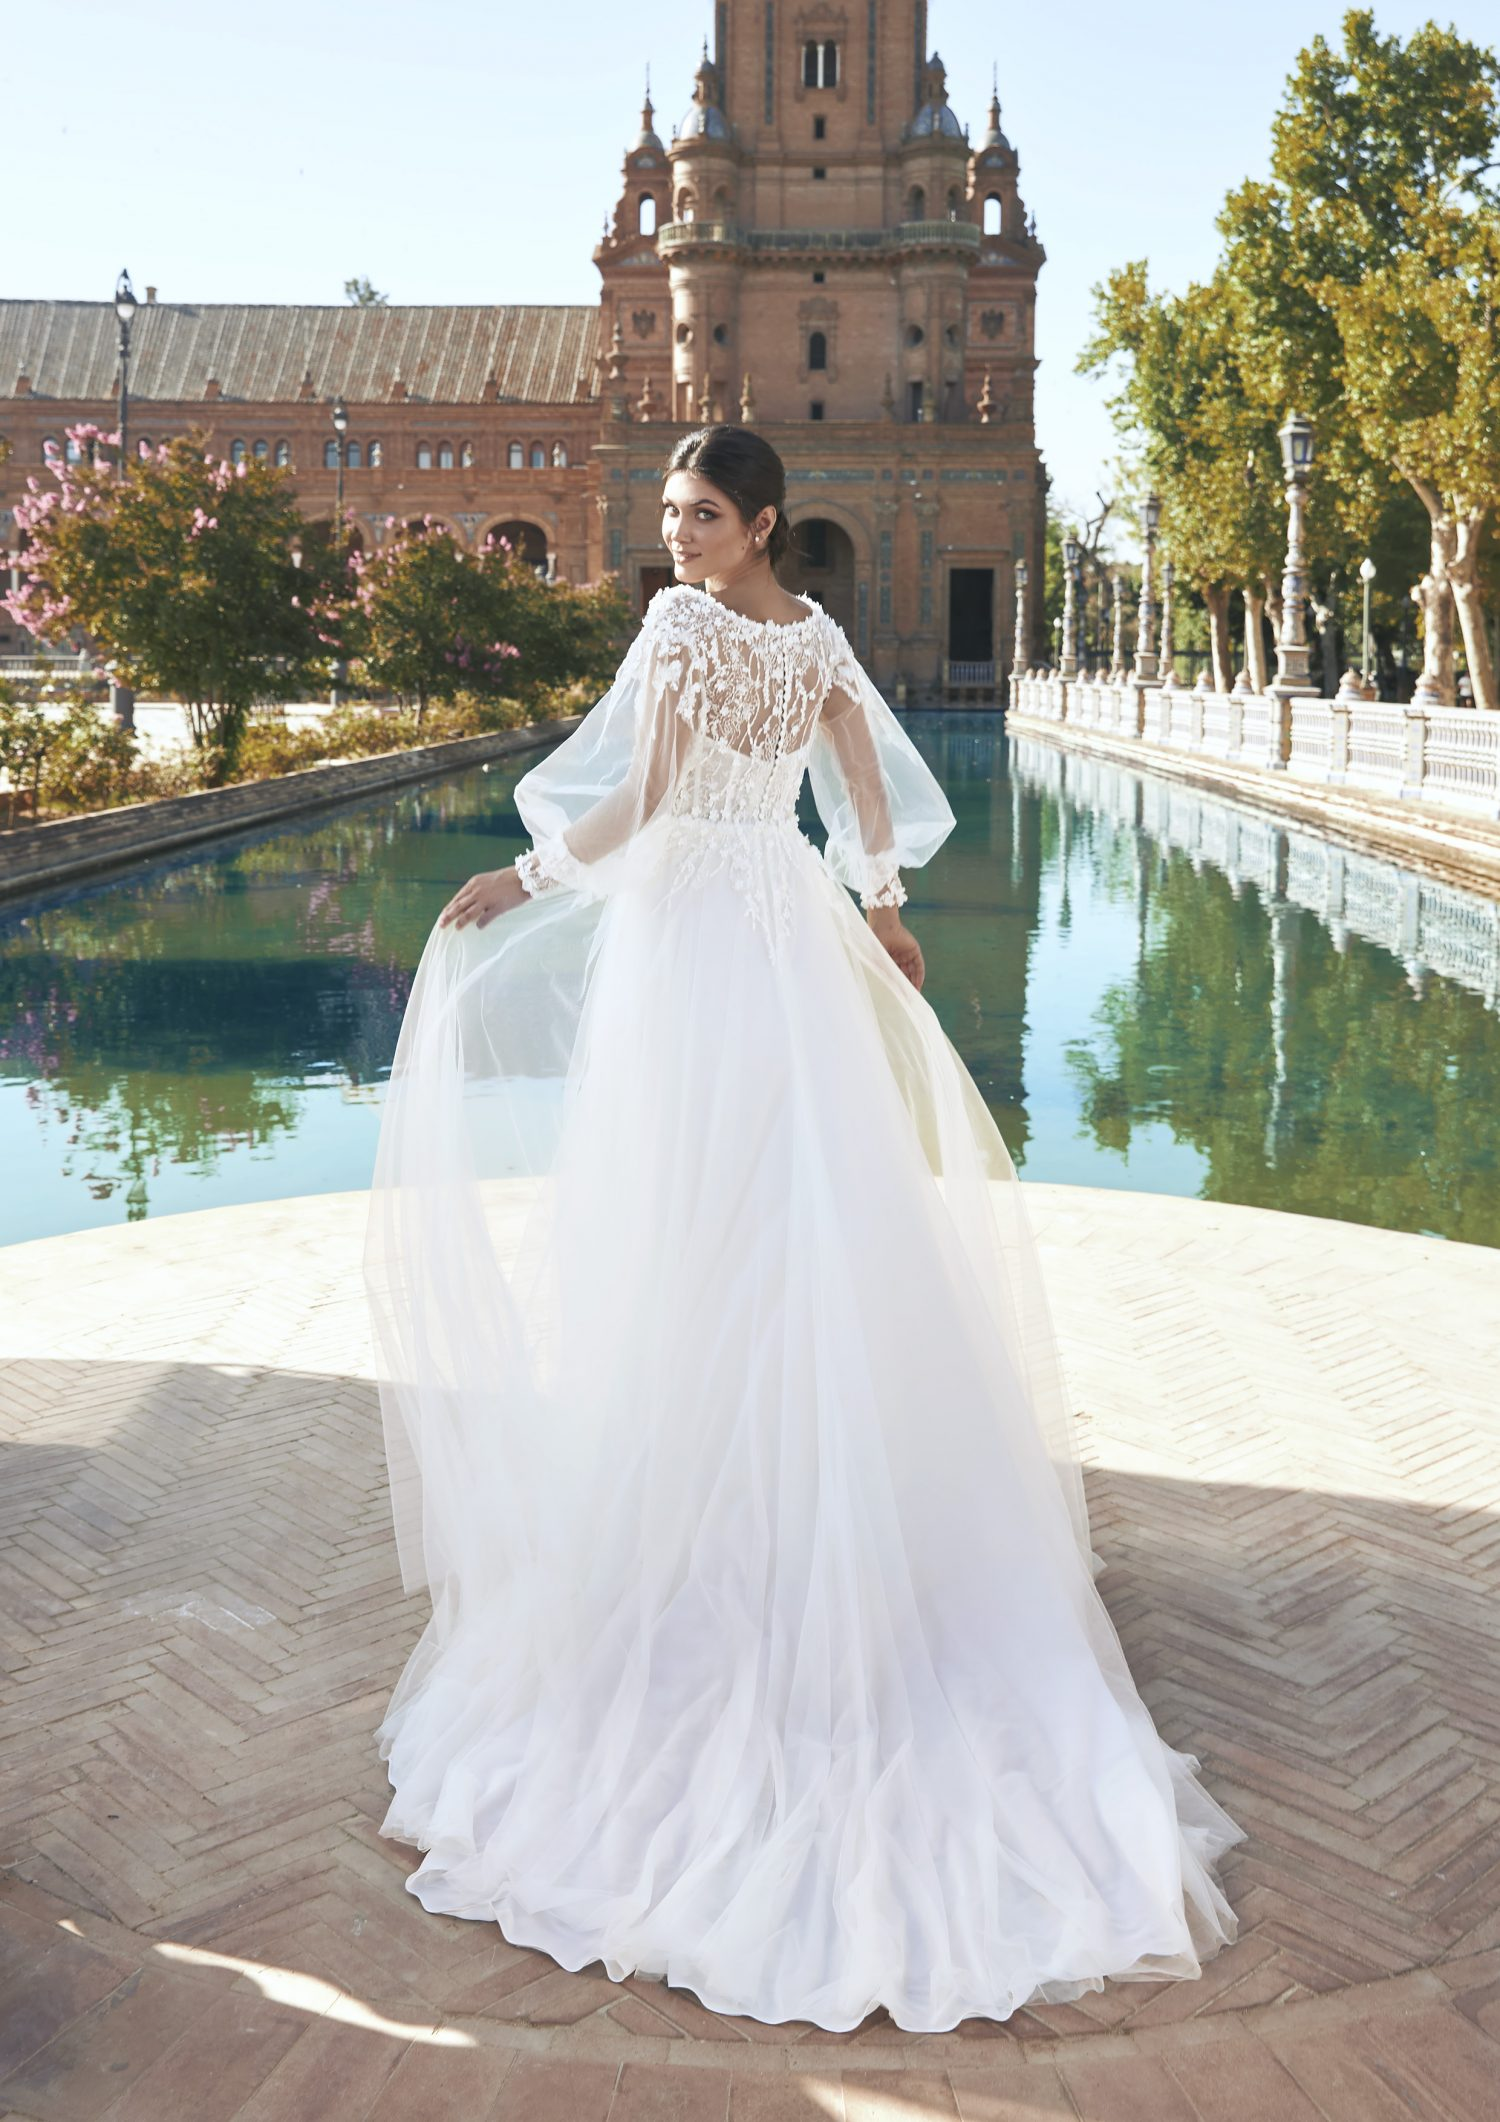 Pronovias vestidos de Novia 2021 Marchesa 85 1 - Marchesa la Nueva Colección de Vestidos de Novia Pronovias 2021